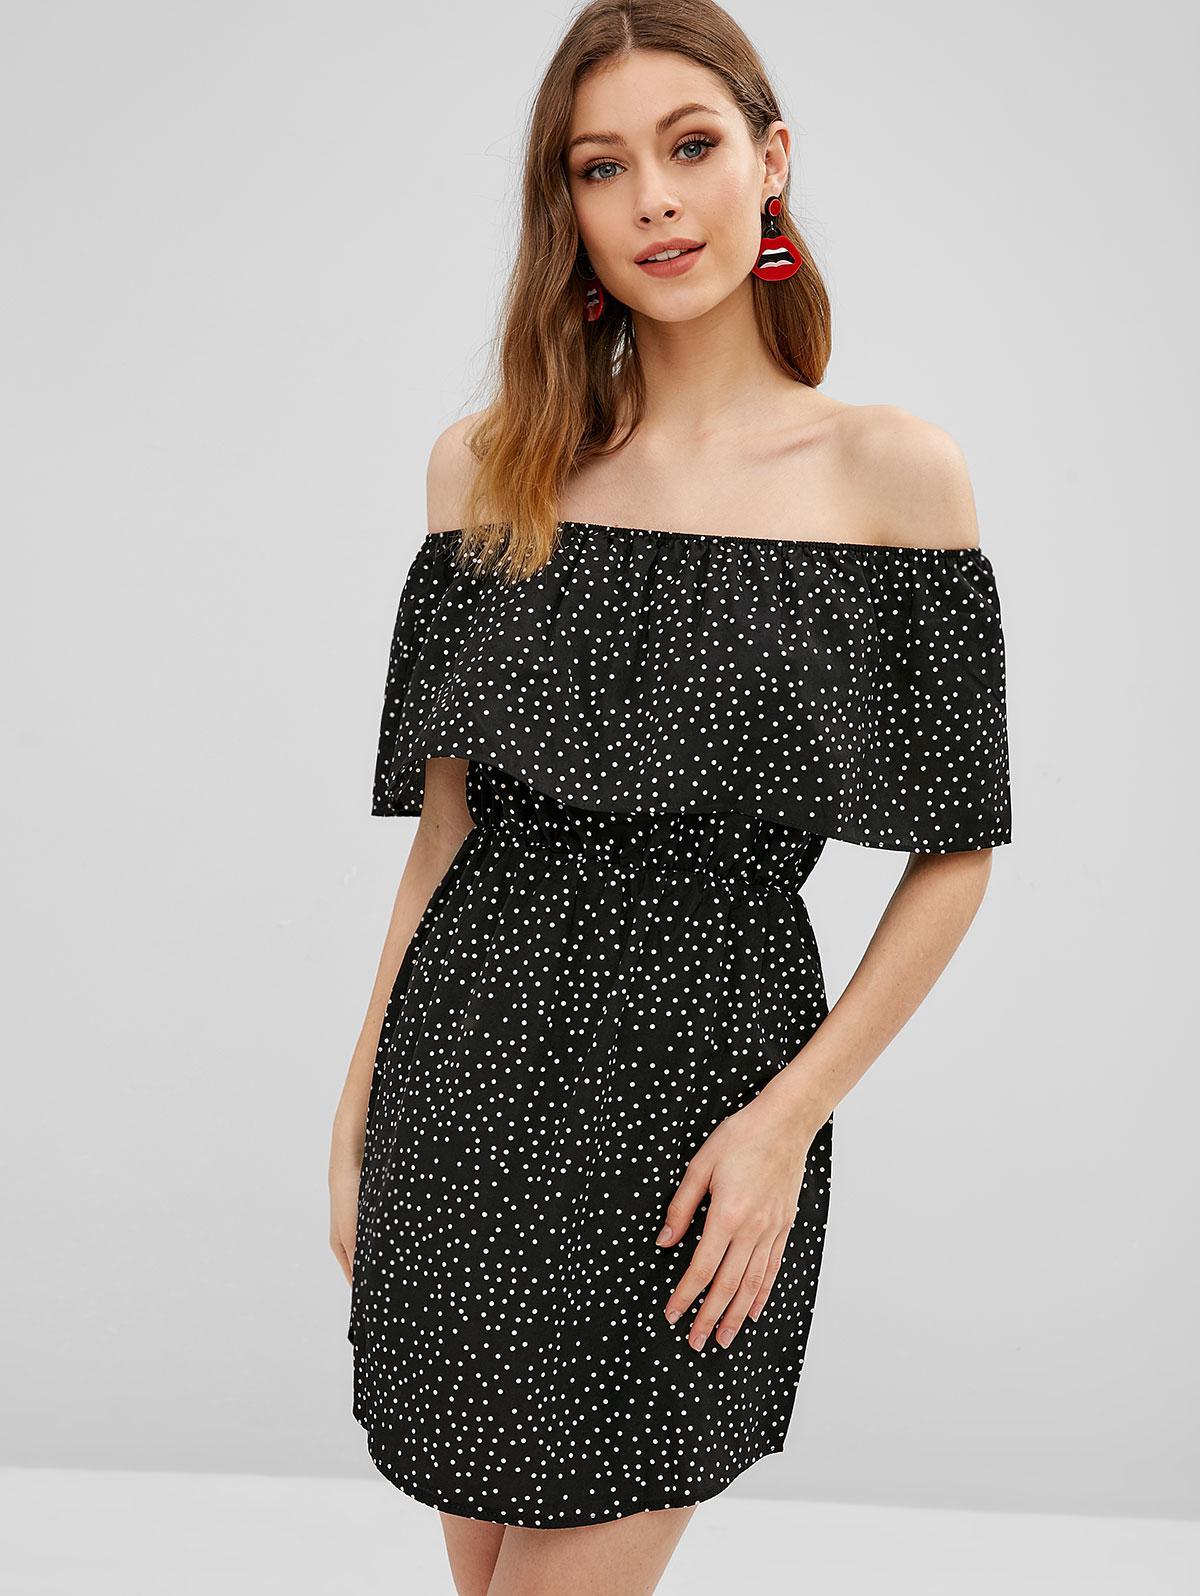 Polka Dot Ruffle Overlay Mini Off Shoulder Dress, Black